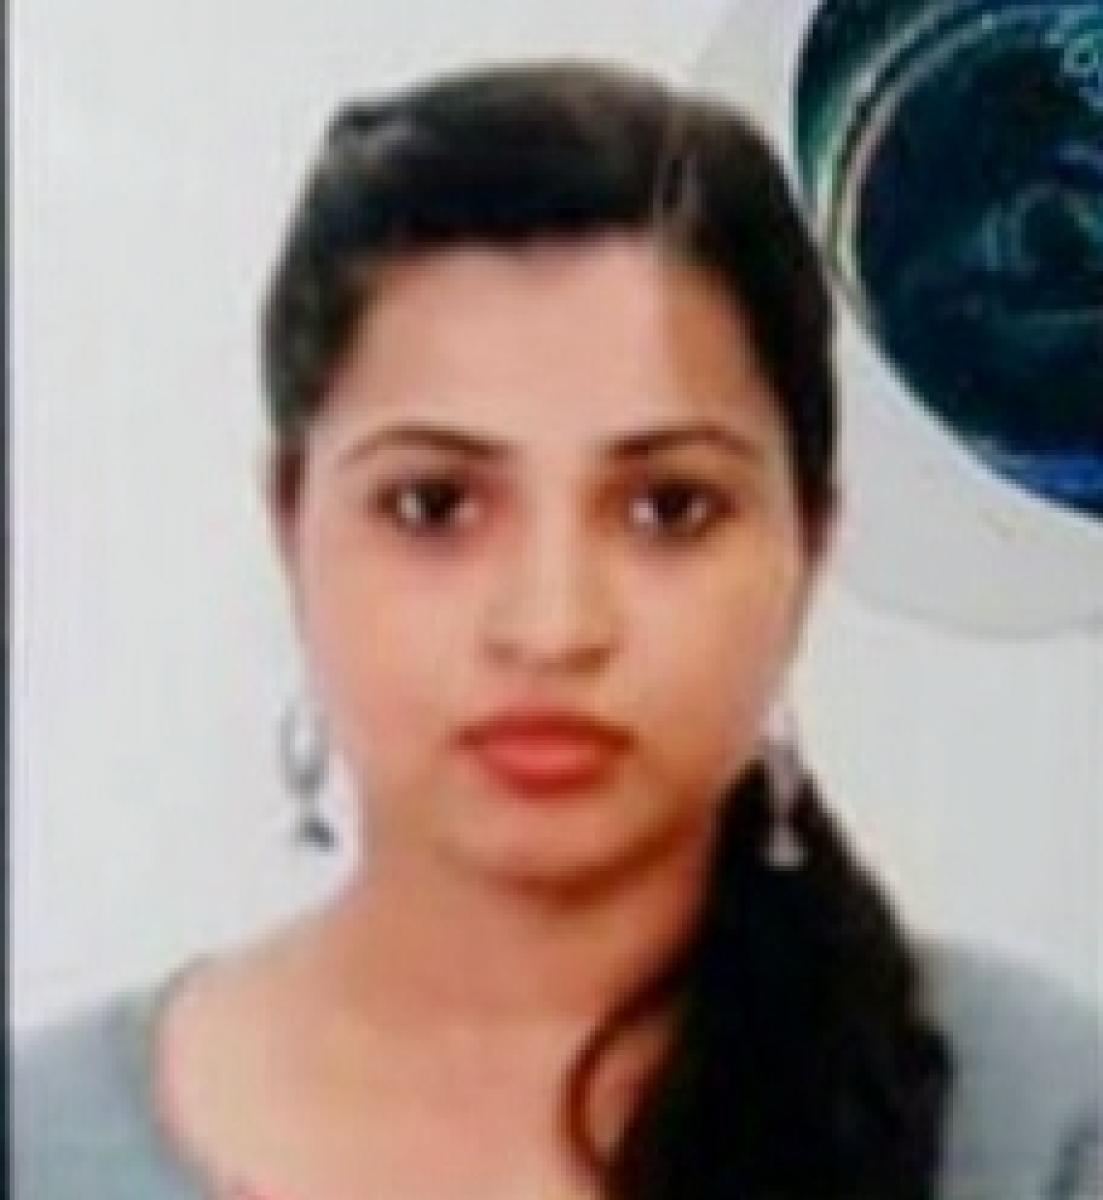 Victim Vijayalakshmi